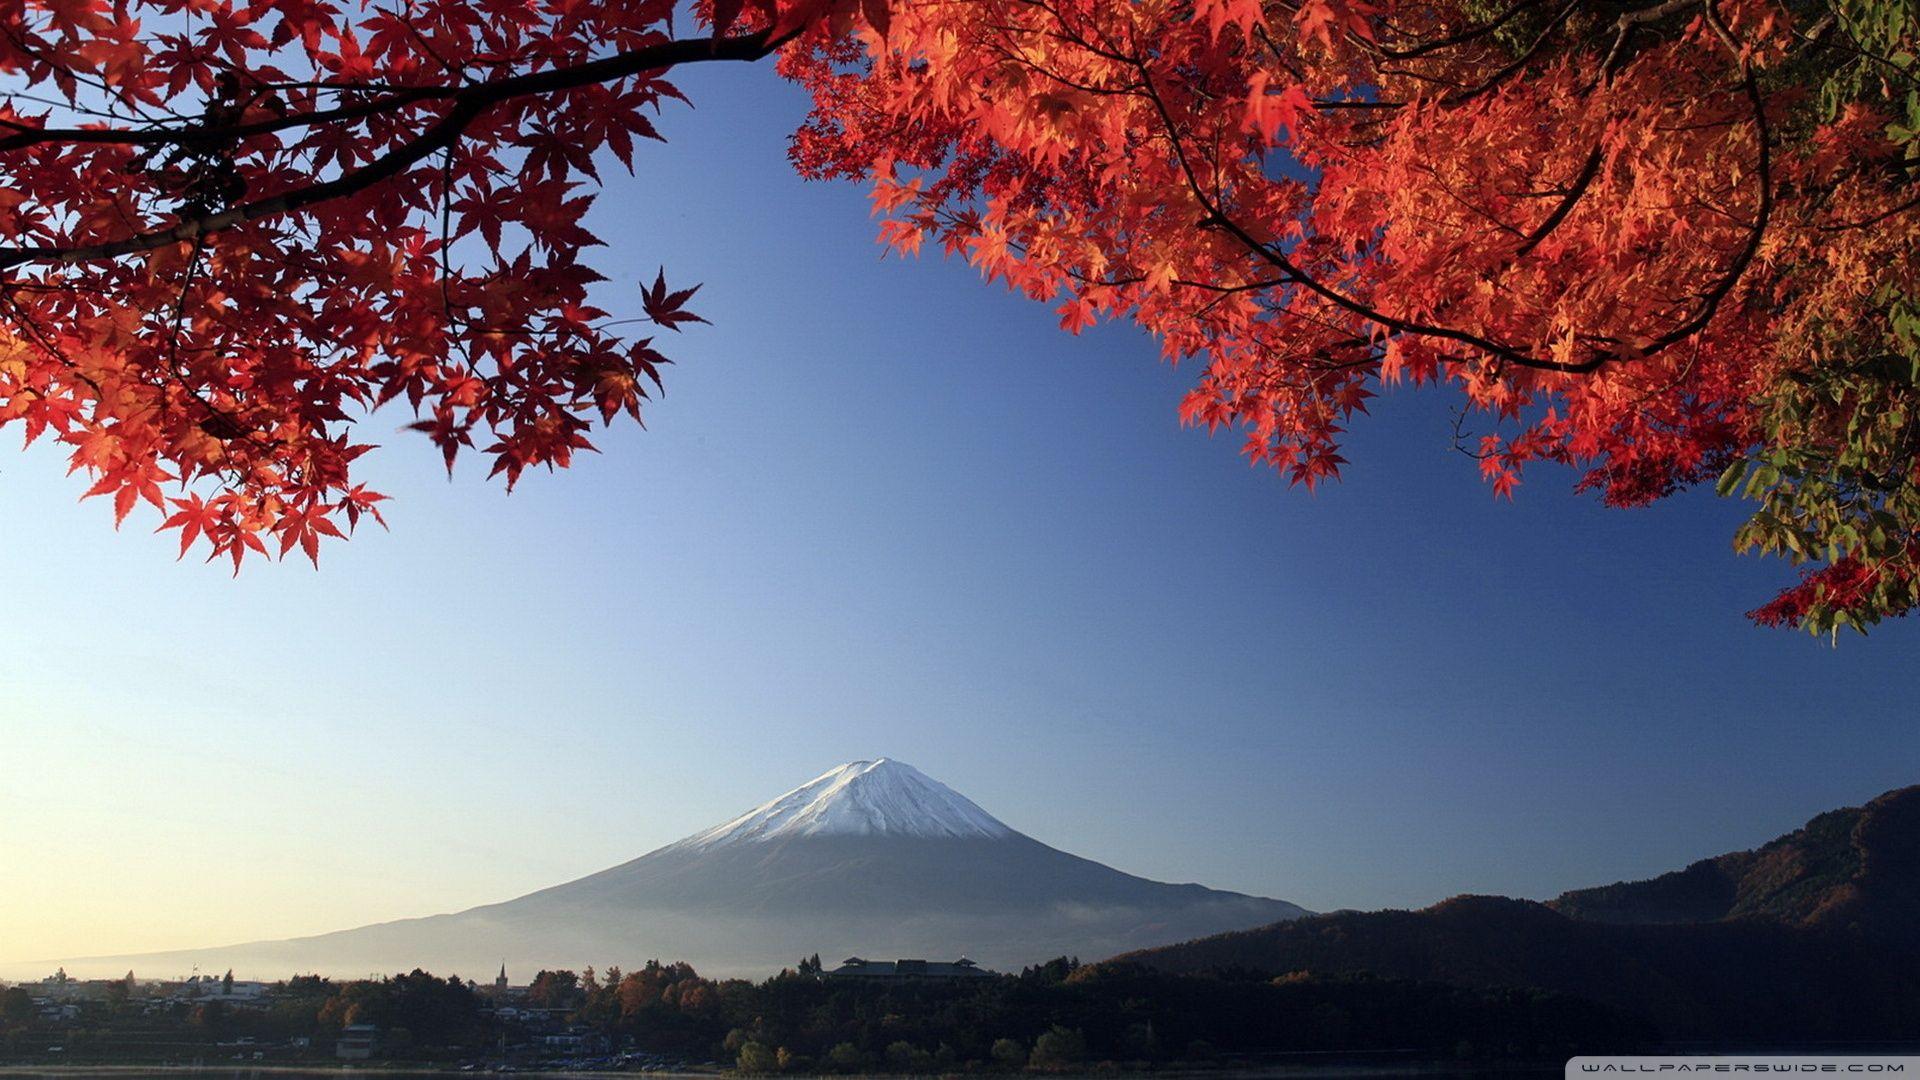 Autumn Mount Fuji Japan Hd Desktop Wallpaper High Definition Mount Fuji Mount Fuji Japan Scenery